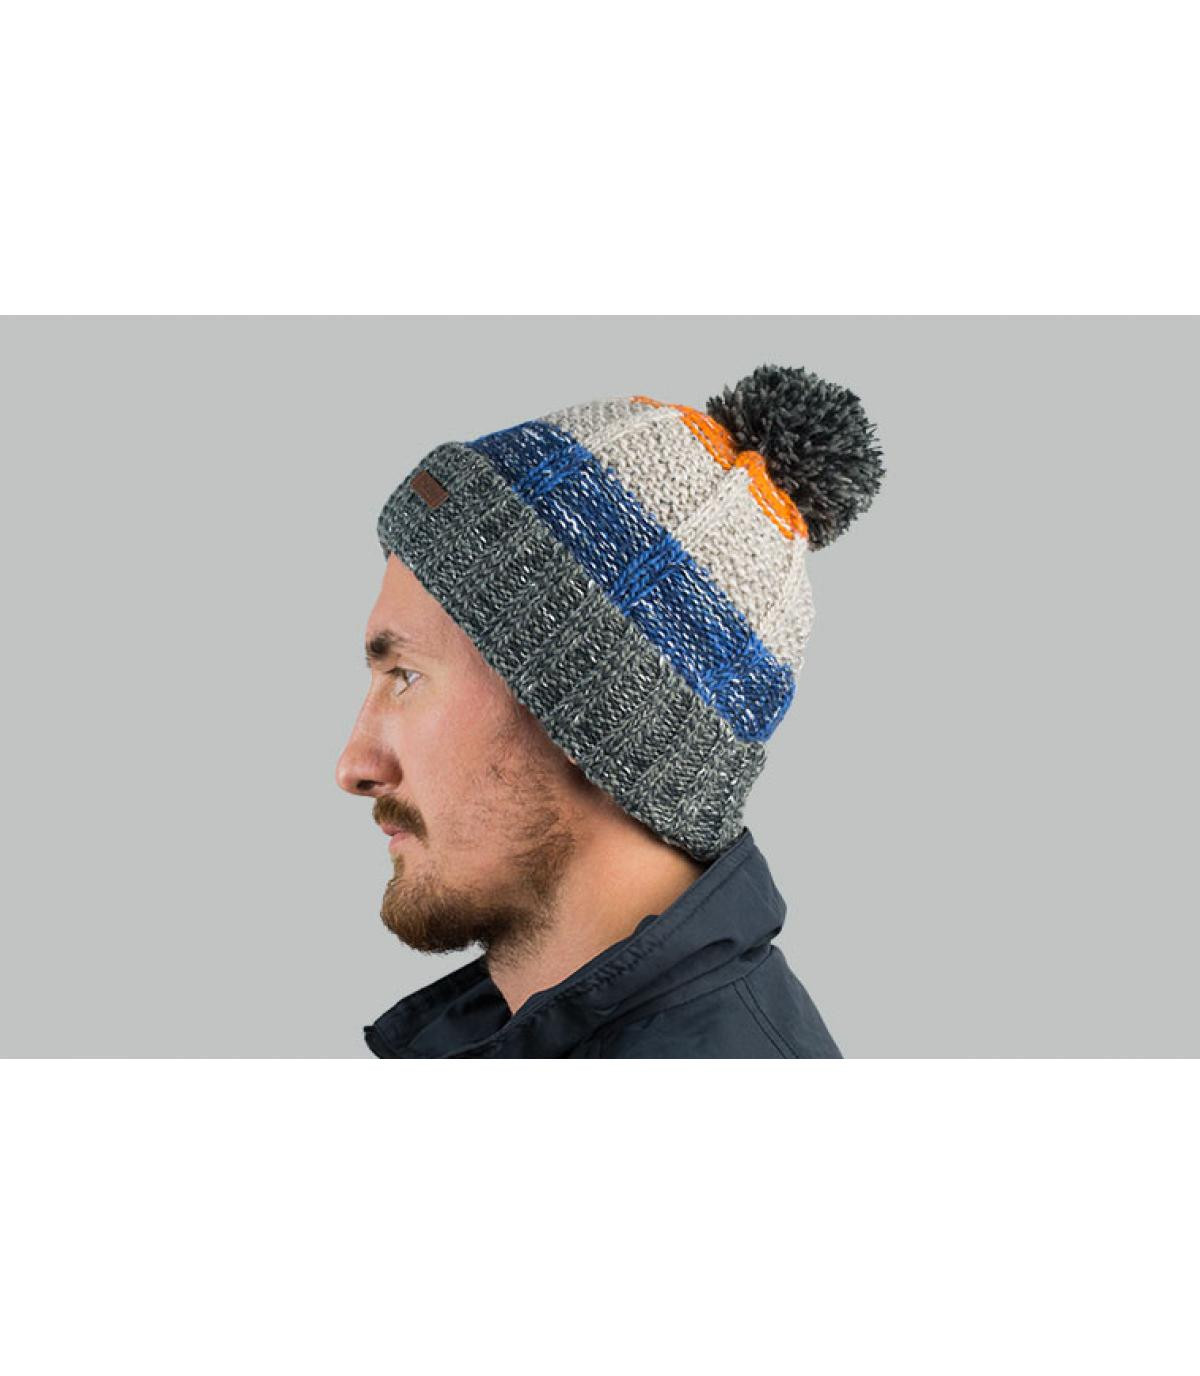 Bommelmütze gestreift grau blau